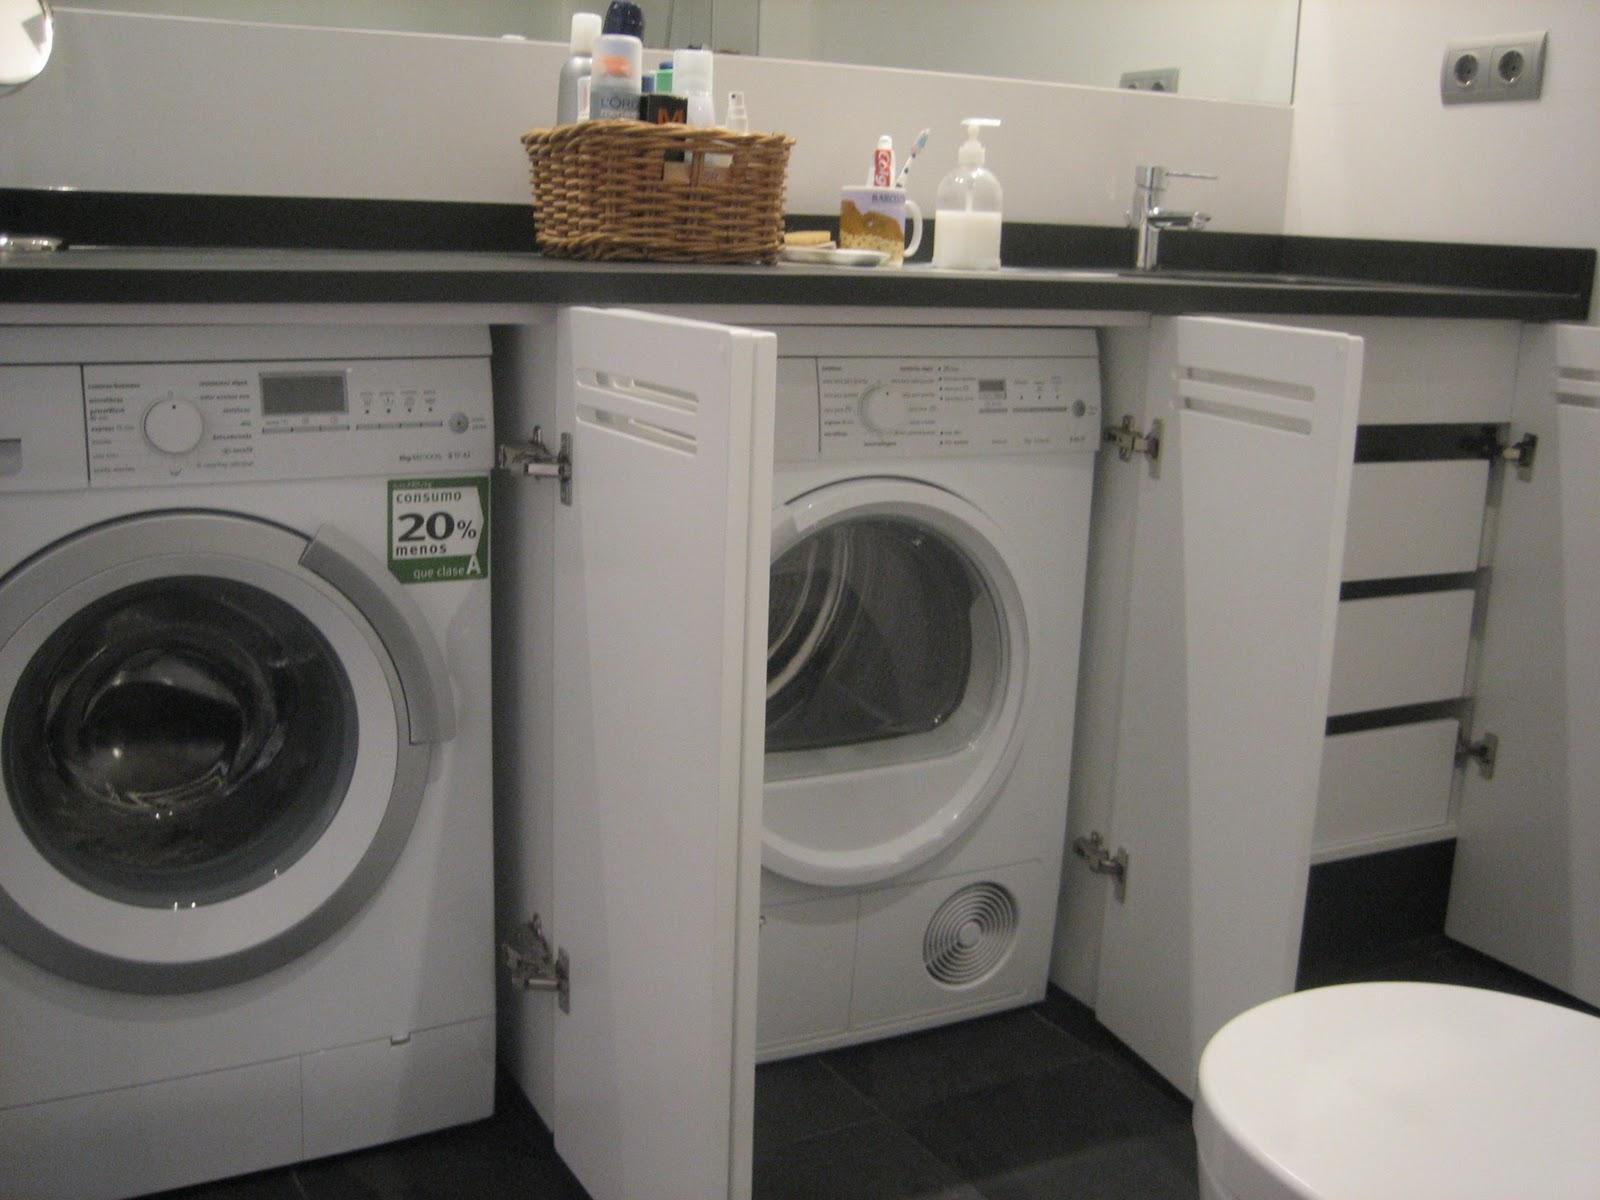 Estudio zep reforma vivienda mmb tibi alicante for Mueble lavadora